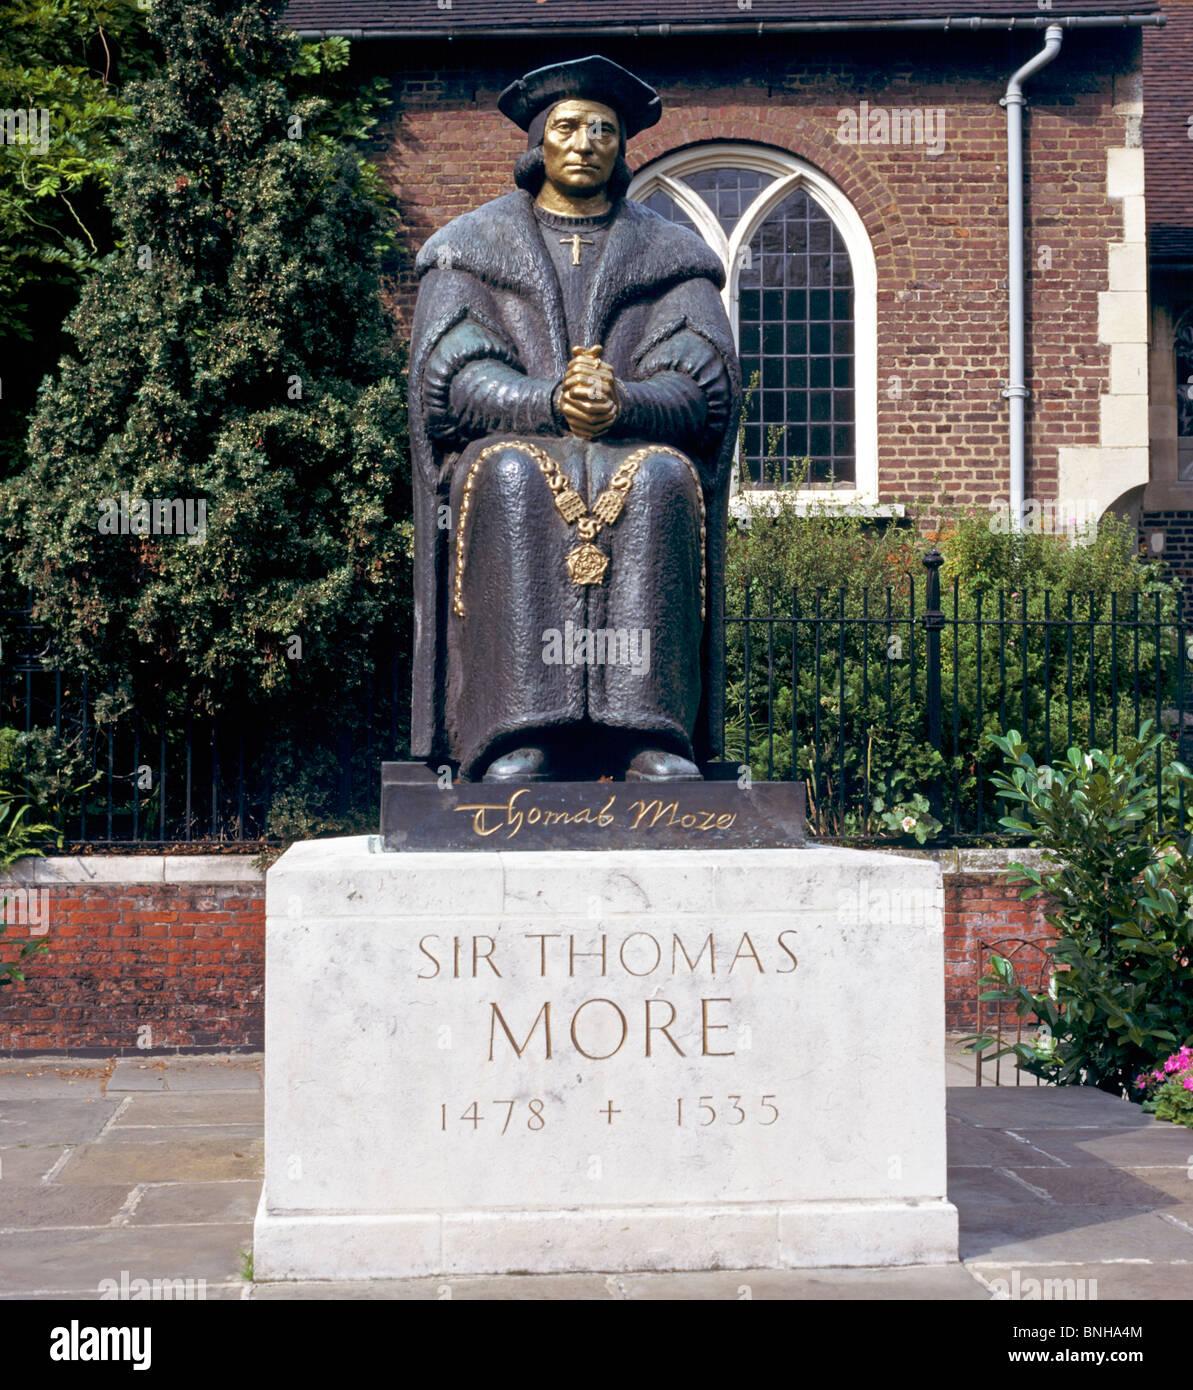 Statue Of Sir Thomas Moore Chelsea Embankment London UK - Stock Image